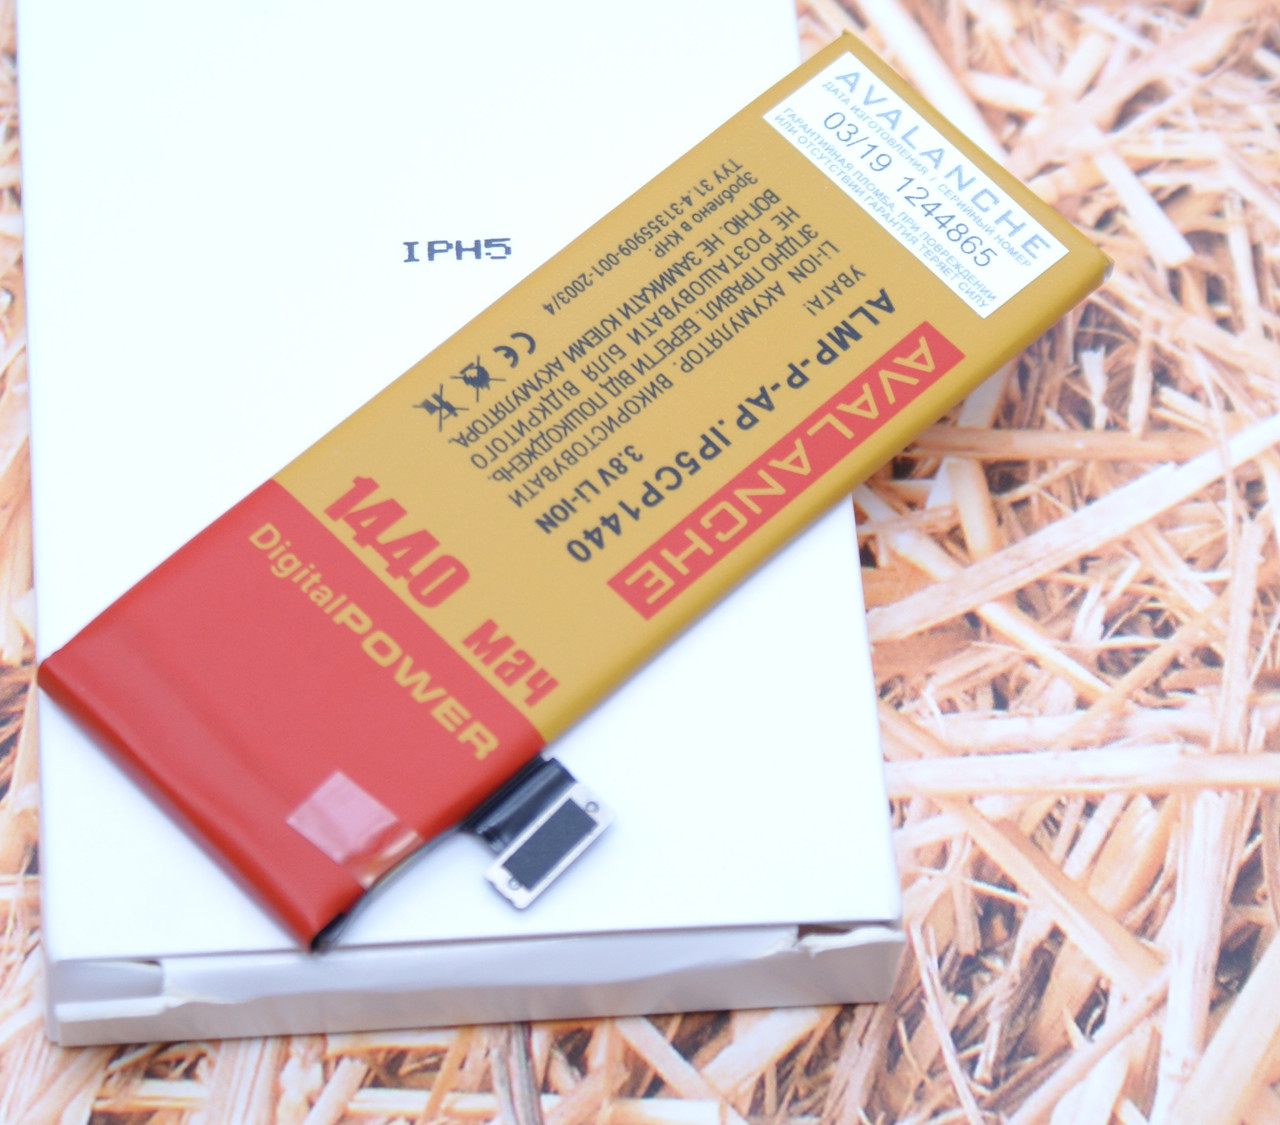 Аккумулятор iPhone 5 Avalanche (1440mAh) ALMP-P-AP.iP5CP1440 (батарея, АКБ), Акумулятор iPhone 5 Avalanche